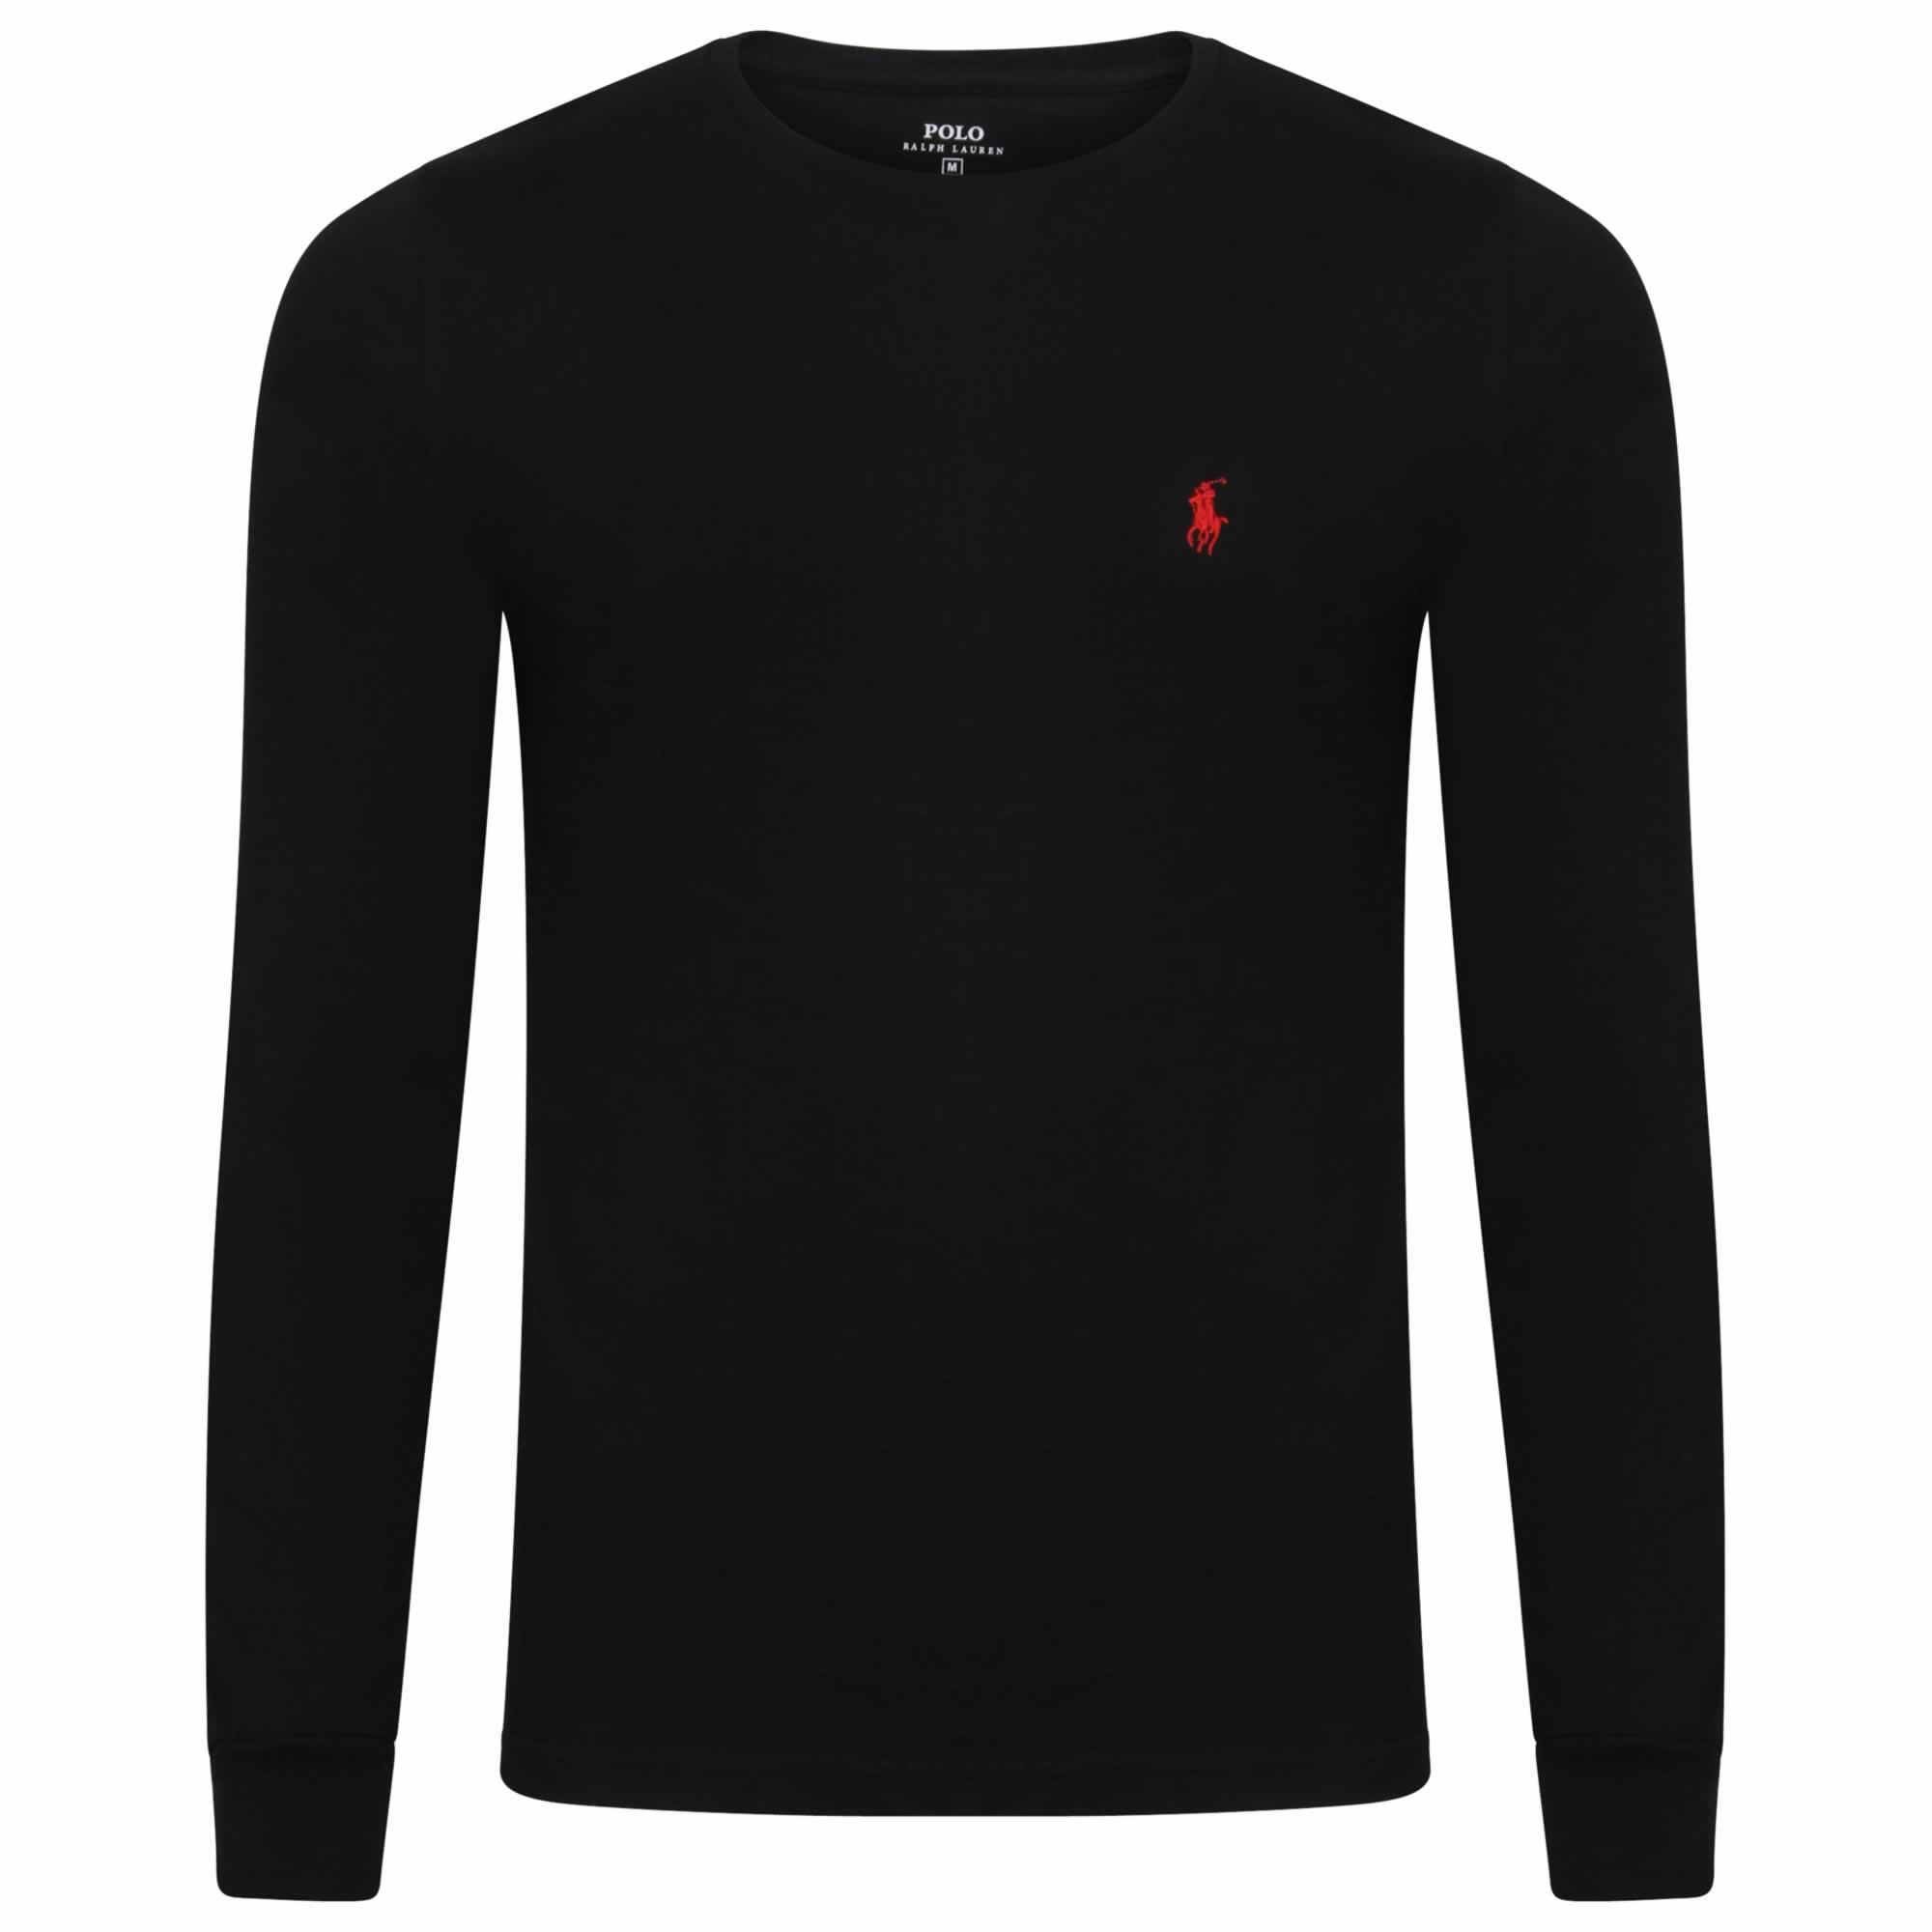 1e26f3dbaac58 Ralph Lauren Long Sleeve Crew T-Shirt. Custom Fit in Black